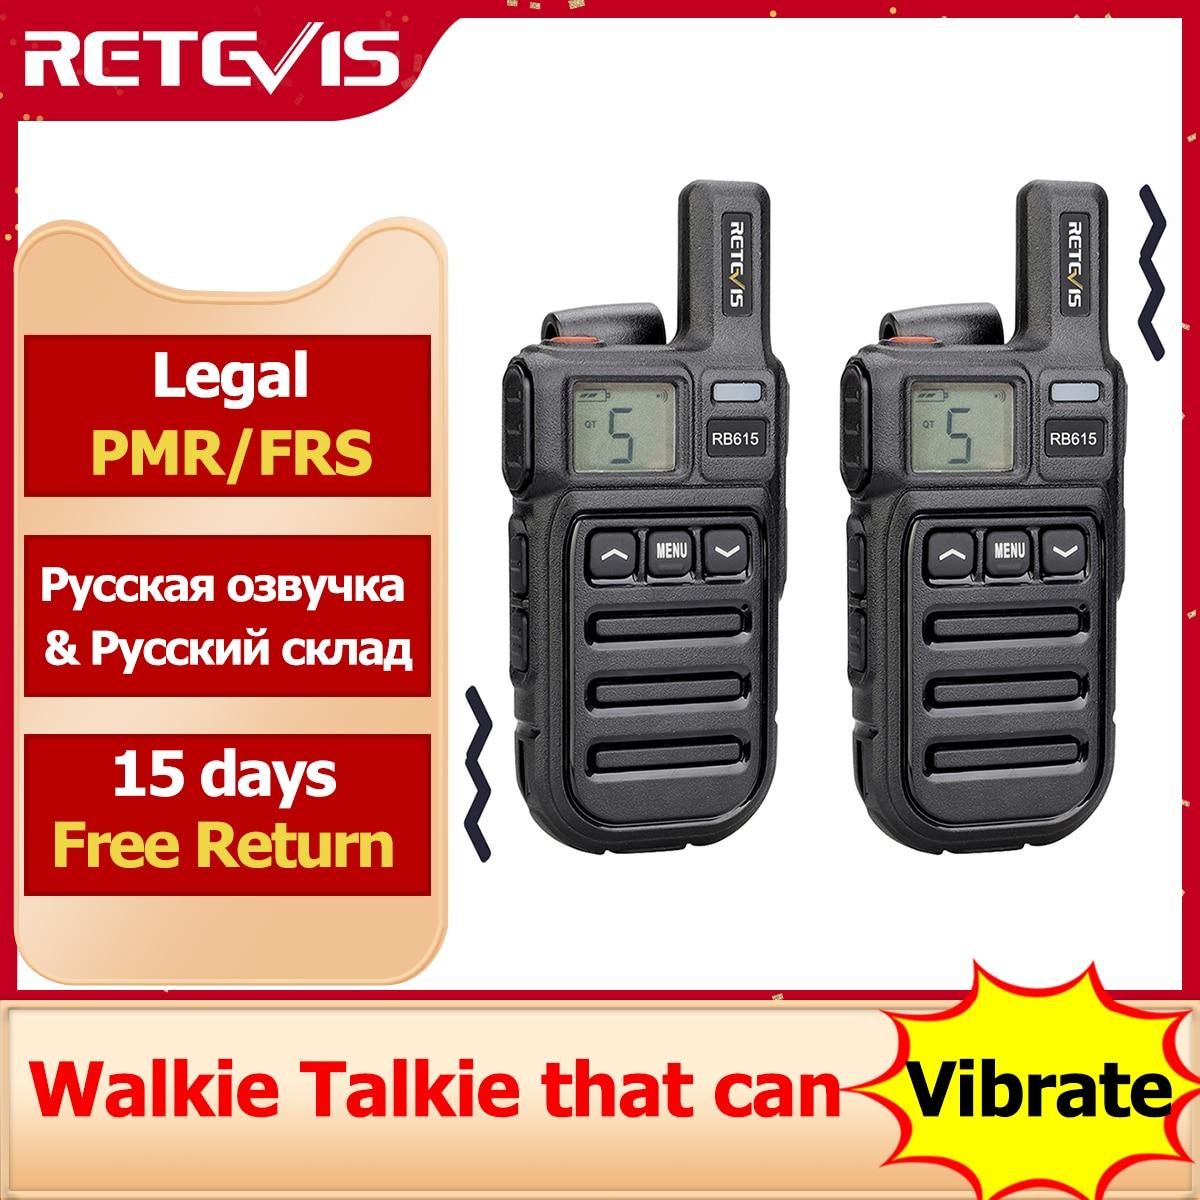 Retevis RB615 PMR 미니 워키 토키 PMR 446 PTT FRS 워키 토키 1 또는 2 pcs 레스토랑 사냥 frs에 대 한 휴대용 양방향 라디오|무전기| - AliExpress